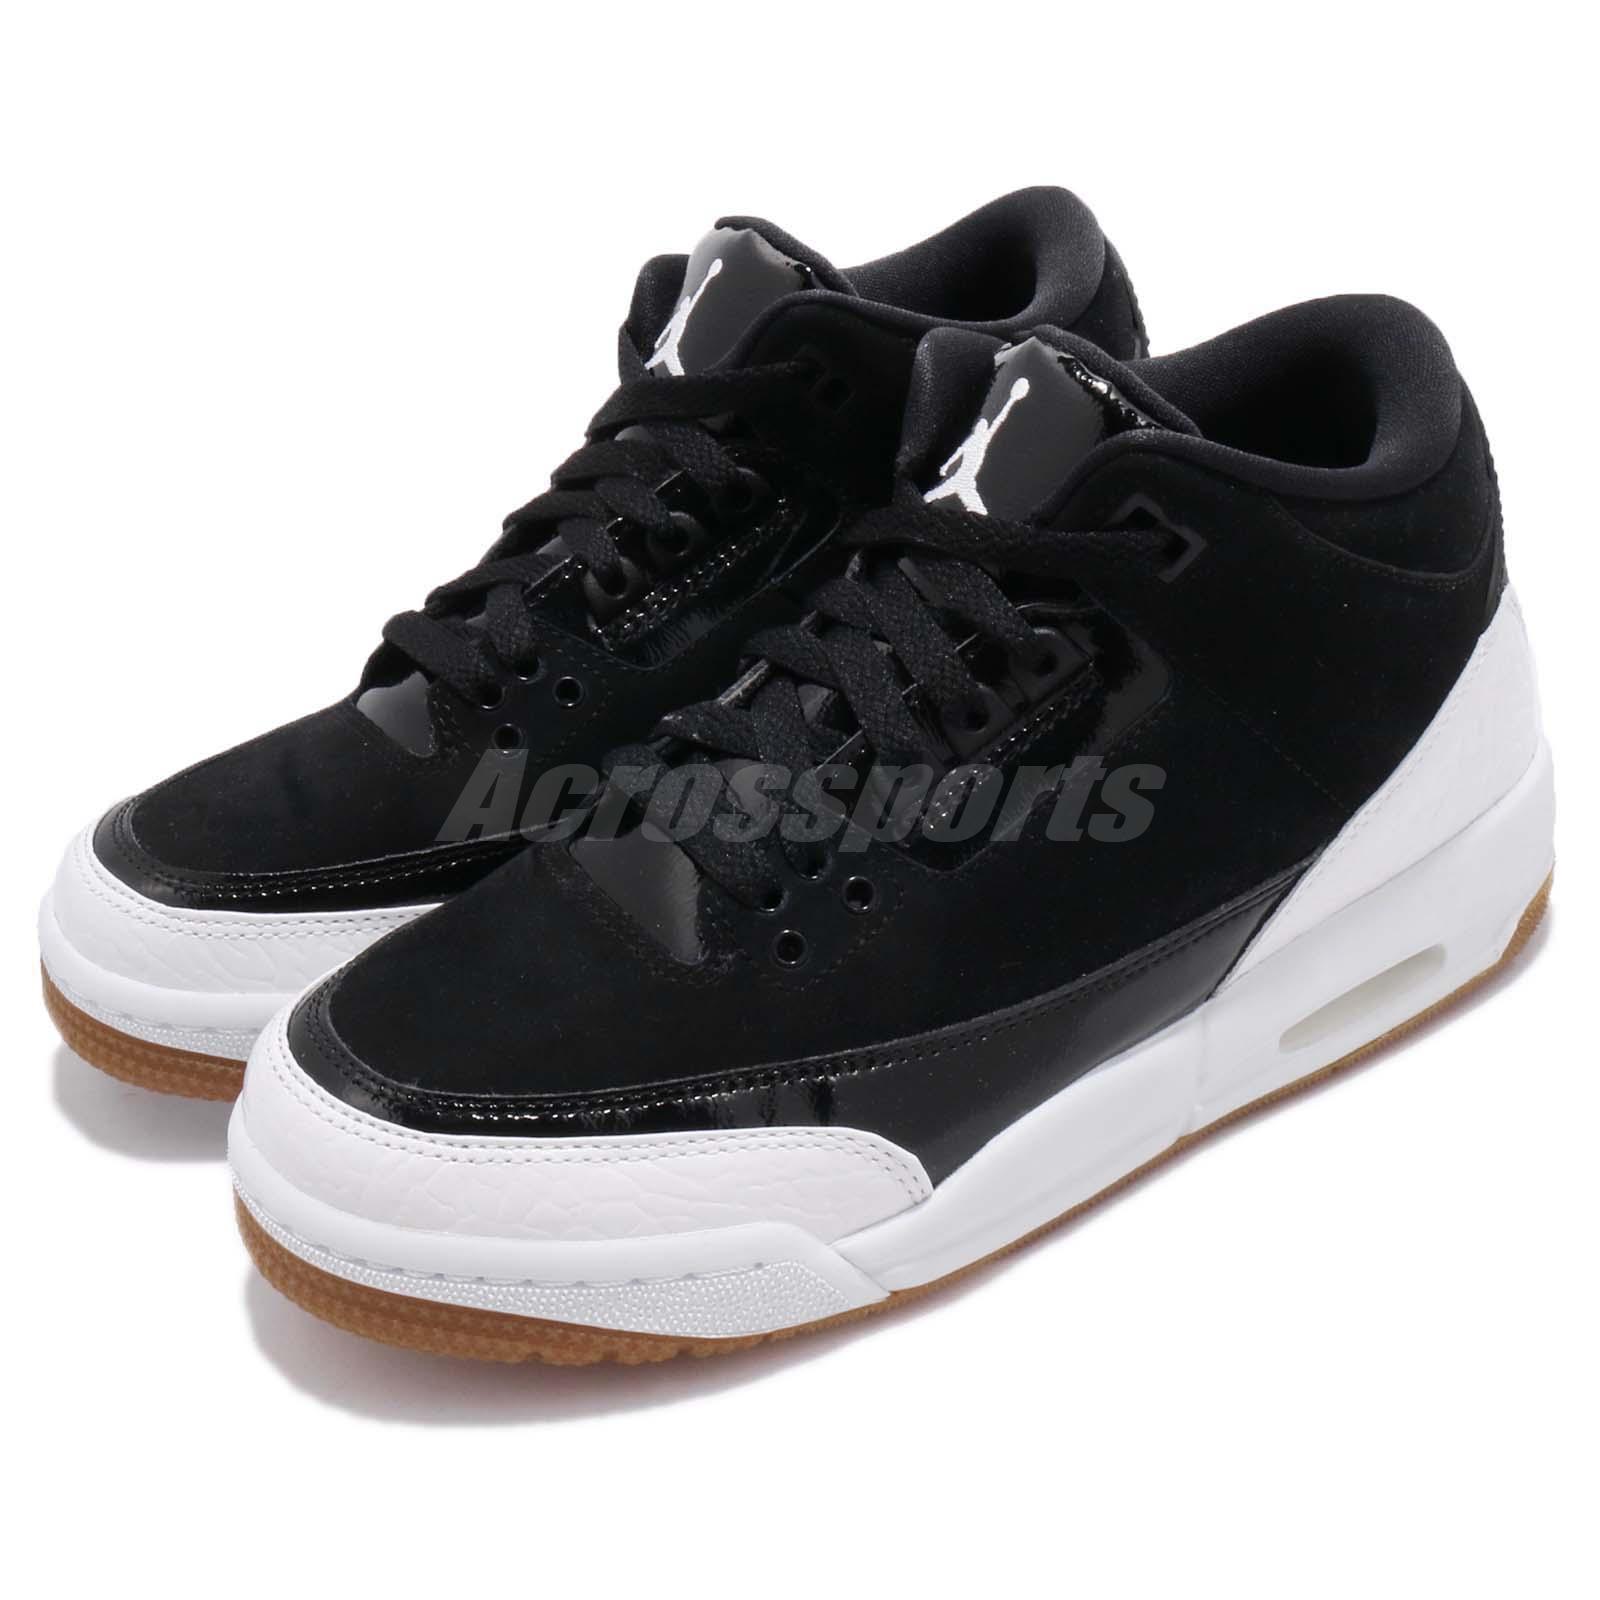 1c3f788f4 Details about Nike Air Jordan 3 Retro GG III Gum Black White Kid Women AJ3  GS Shoes 441140-022